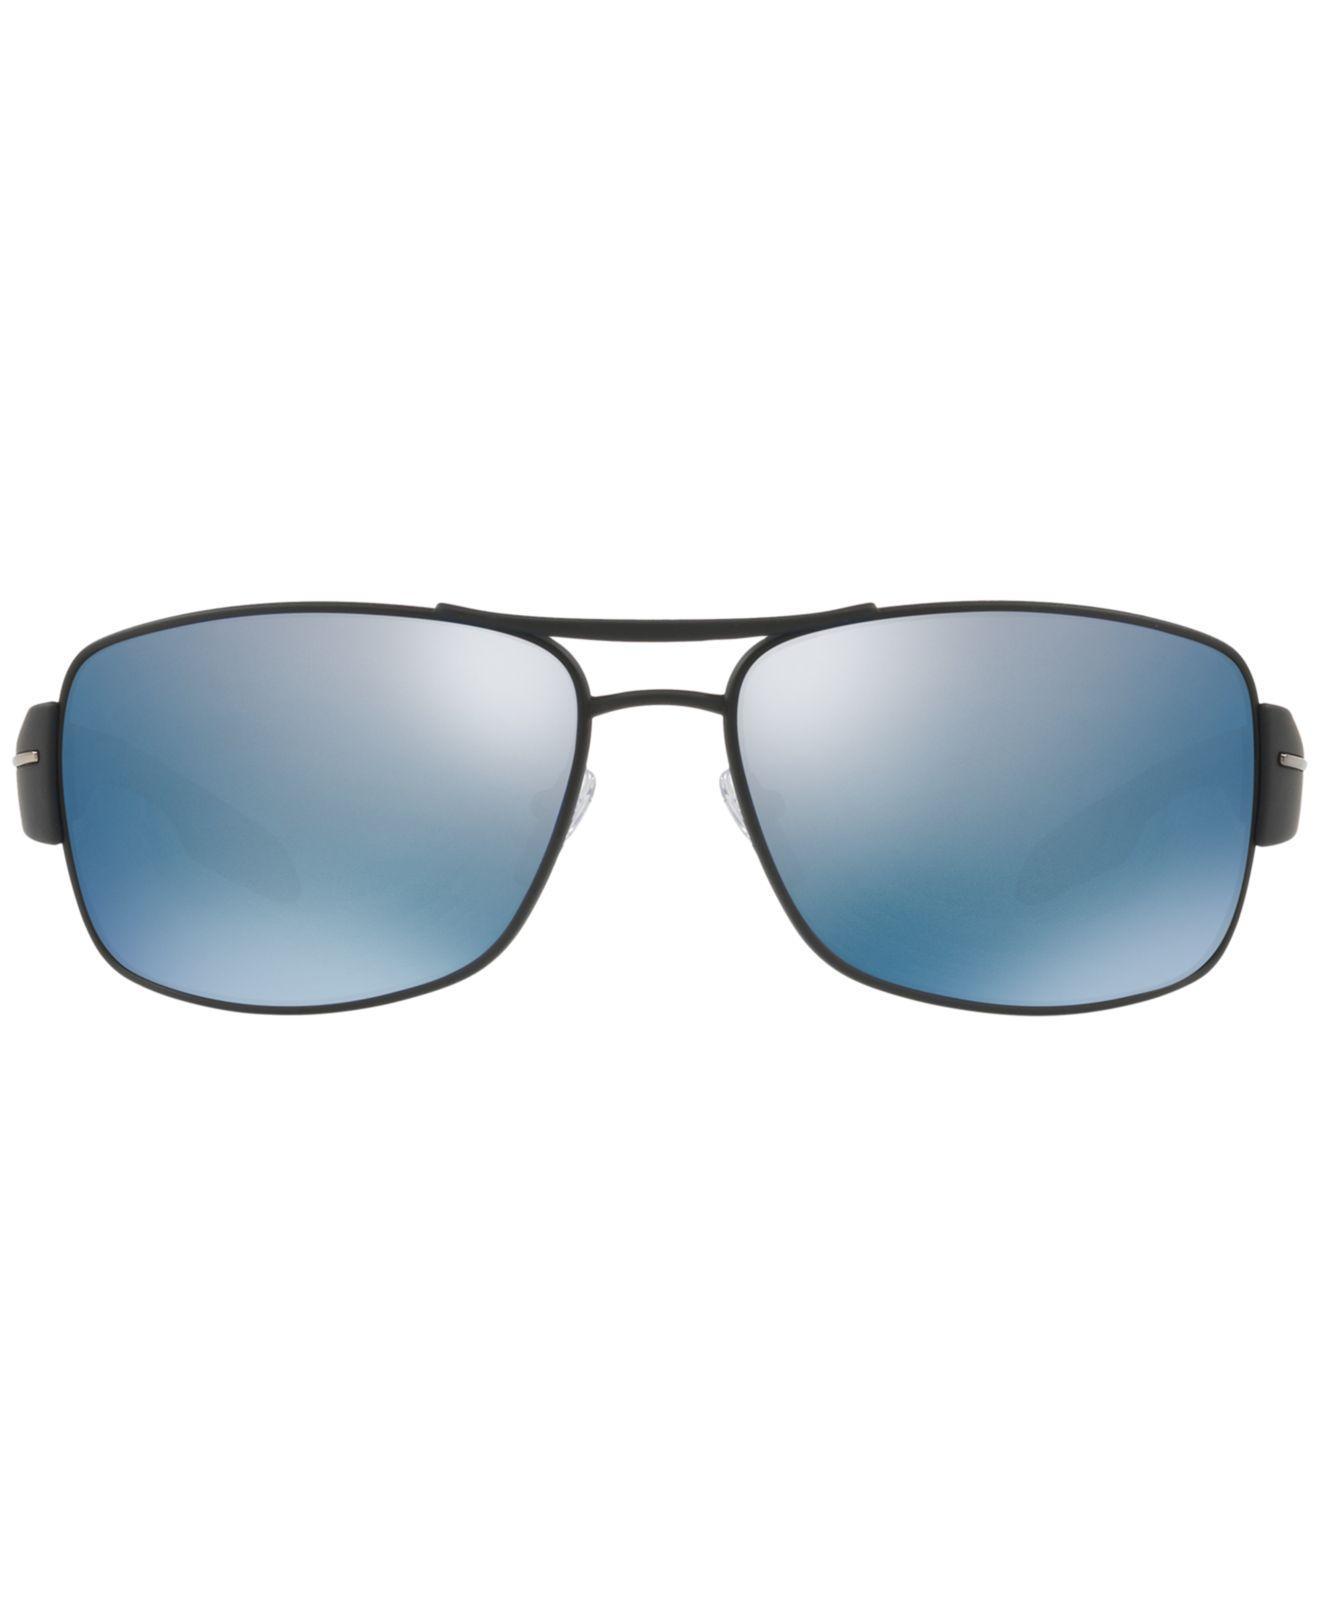 cdef1520fc919 Lyst - Prada Polarized Sunglasses